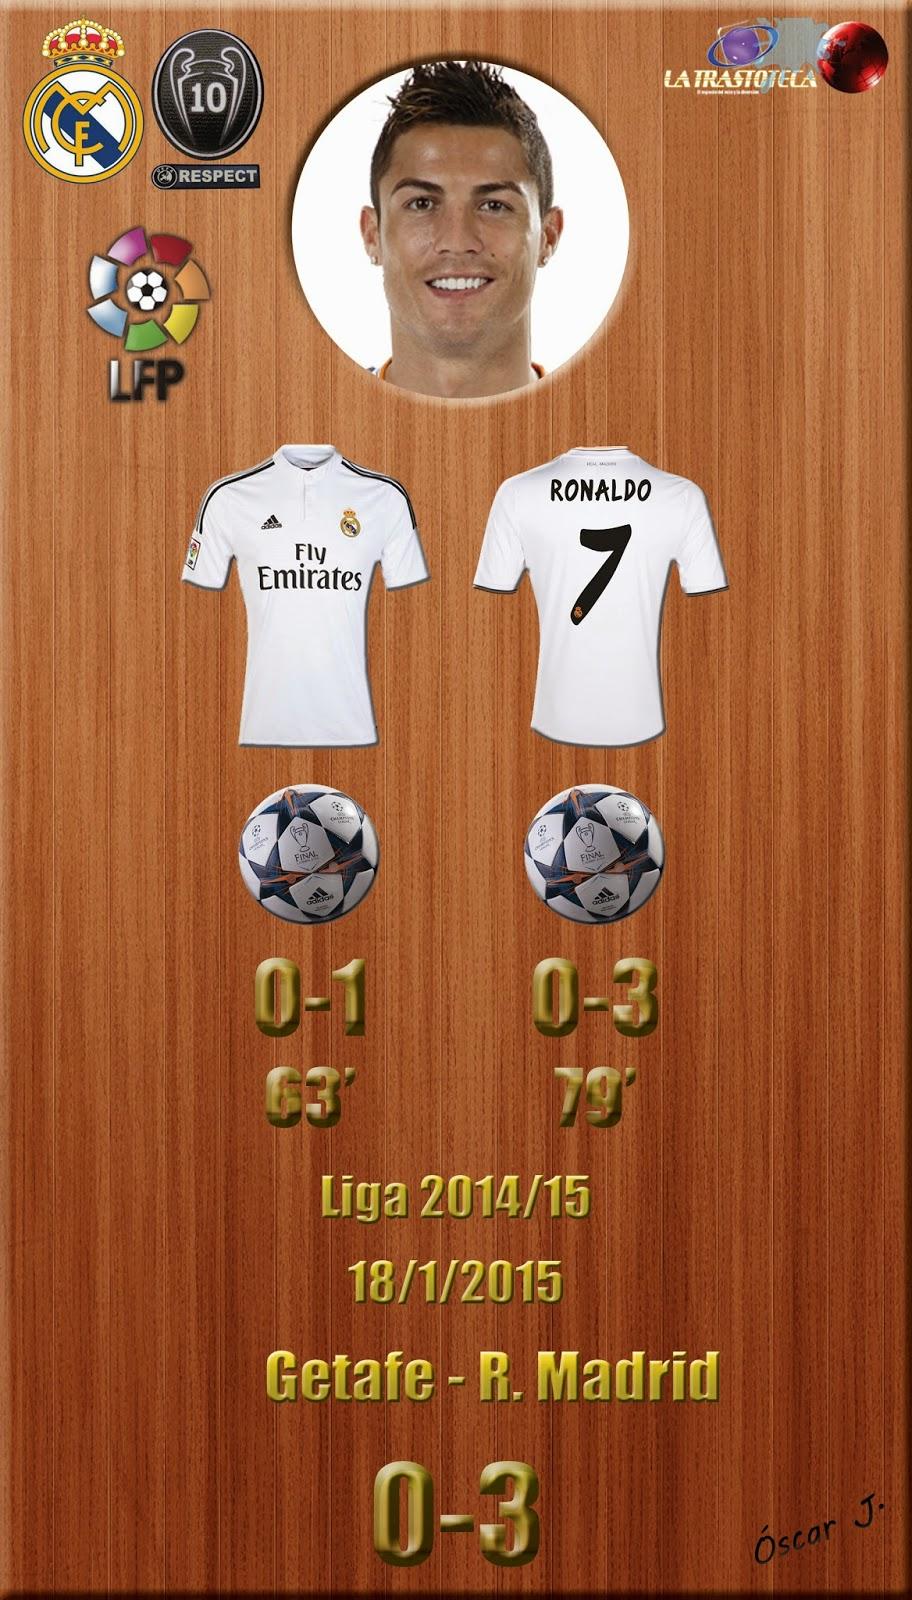 Cristiano Ronaldo (doblete) - Getafe 0-3 Real Madrid - Liga 2014/15 - Jornada 19 - (18/1/2015)